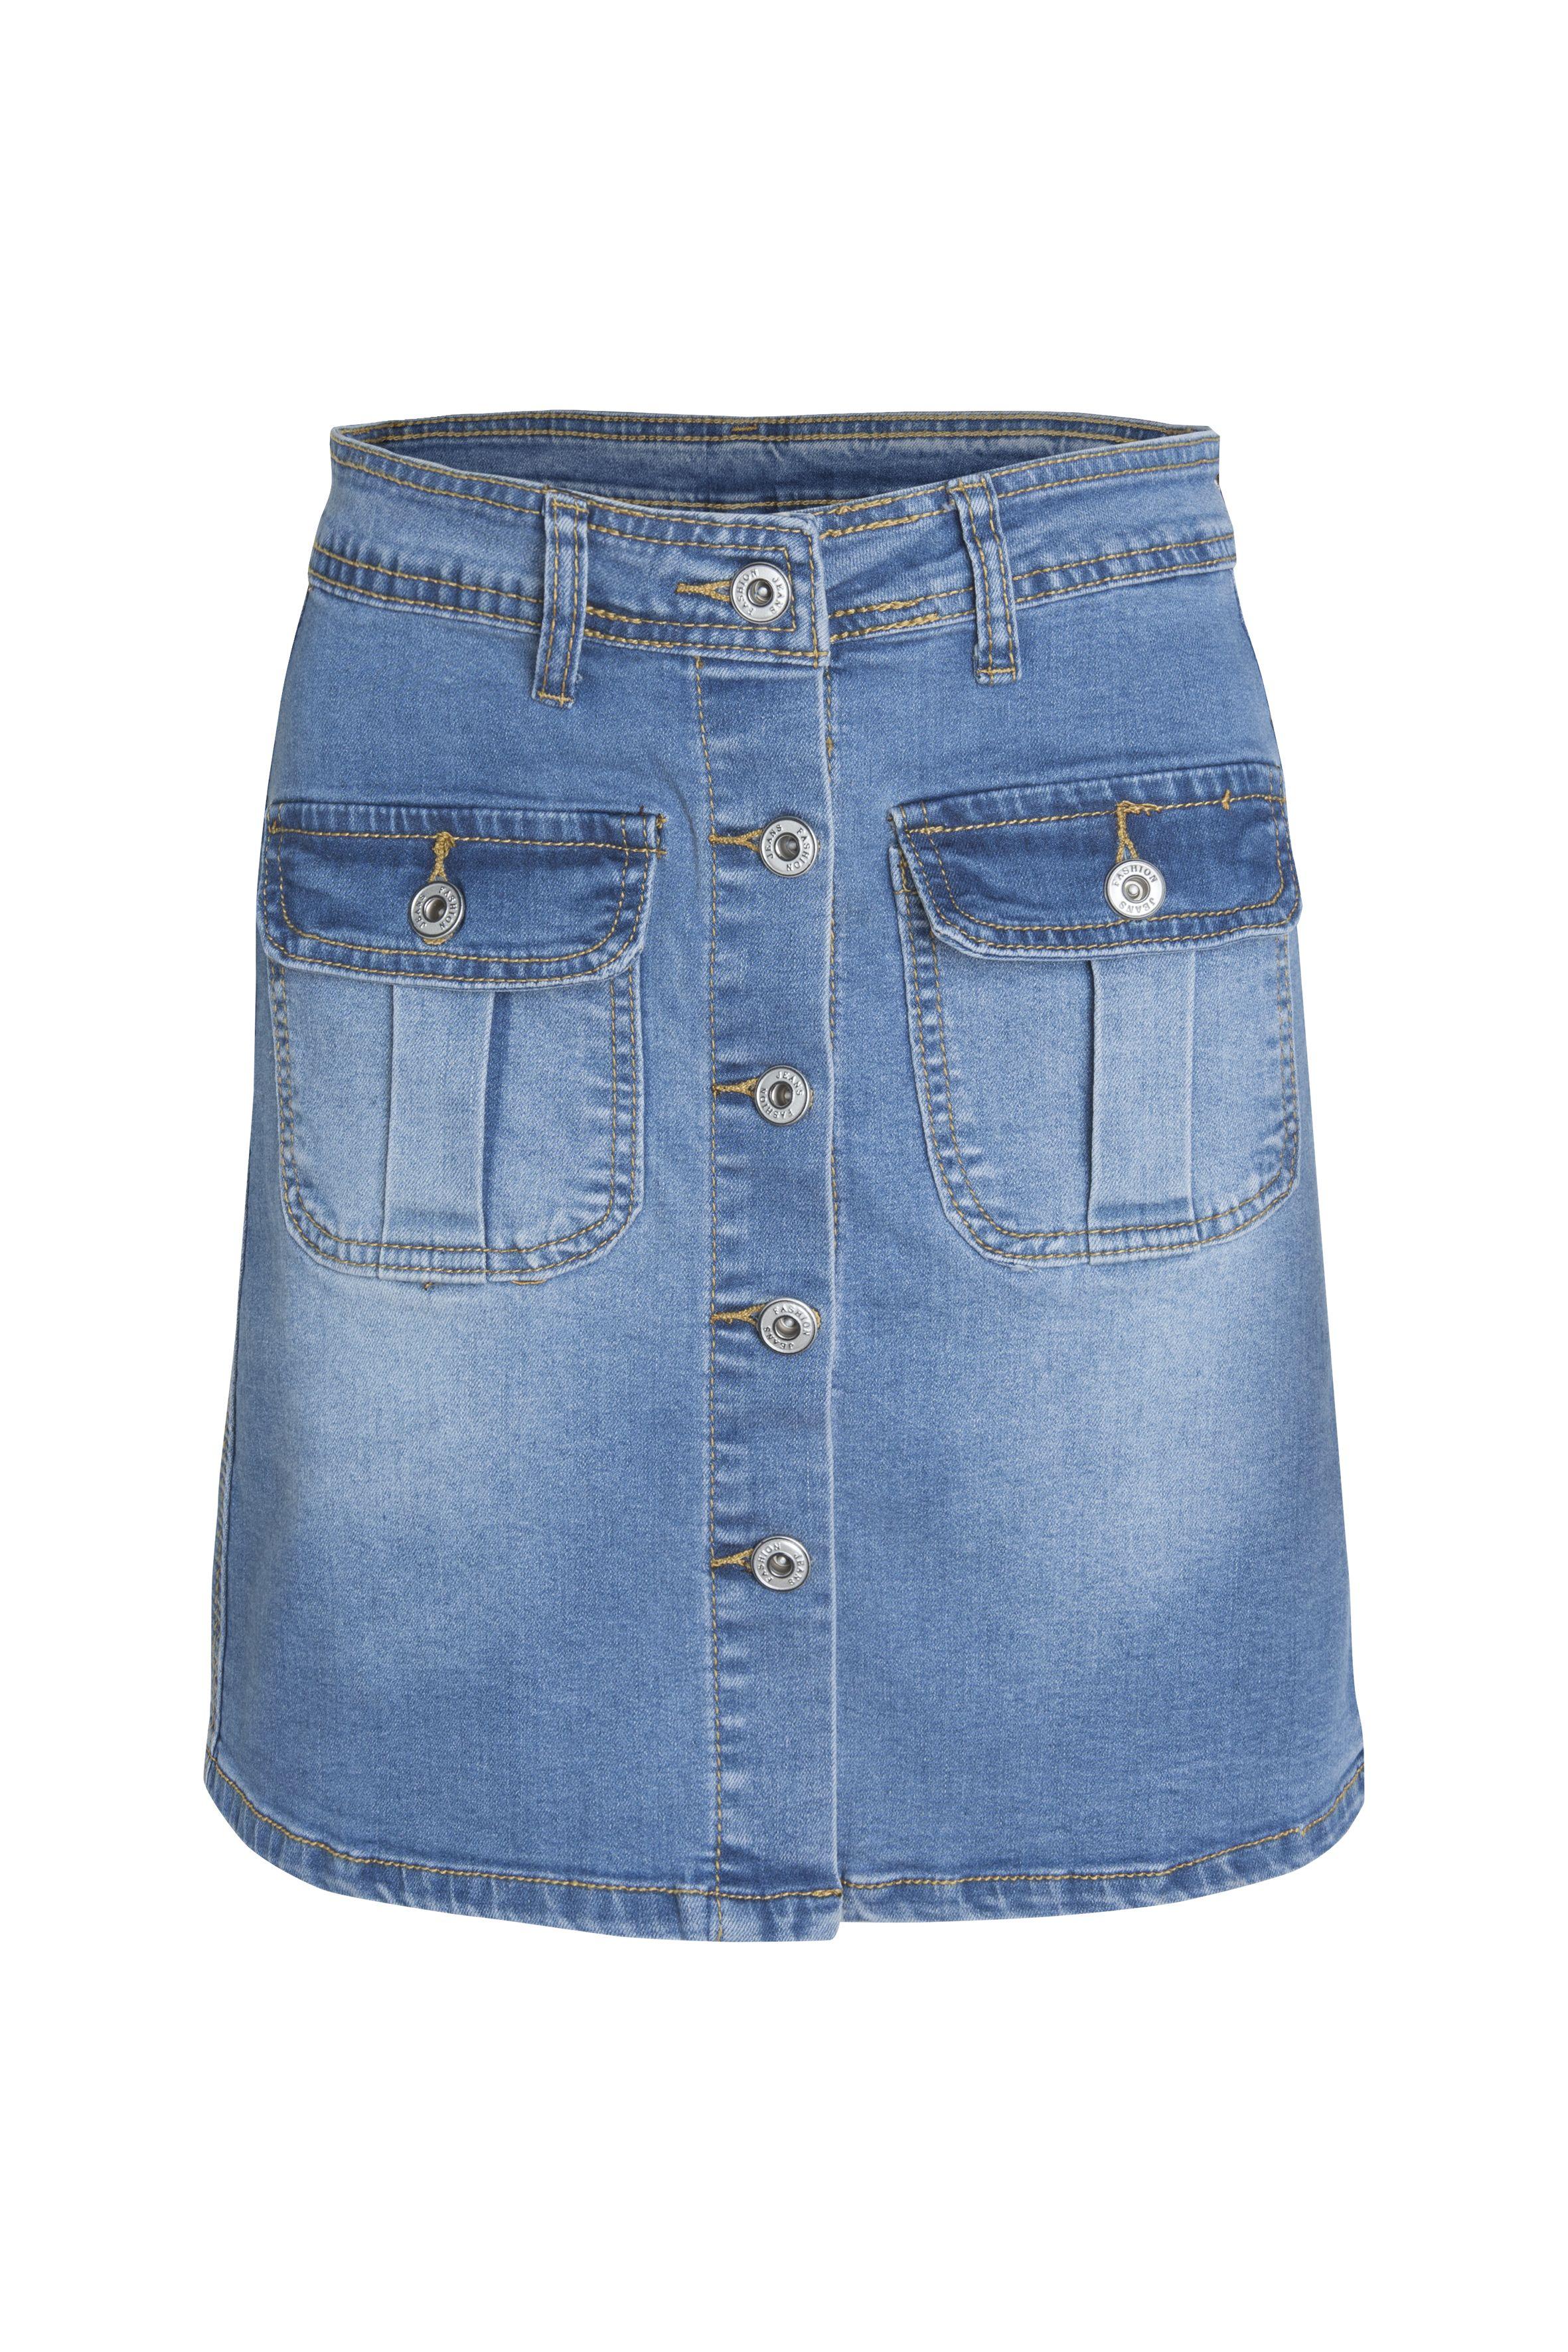 Falda denim juvenil. Corte evasé. Bolsillos delanteros. #girl #denim #skirt #fashion #style